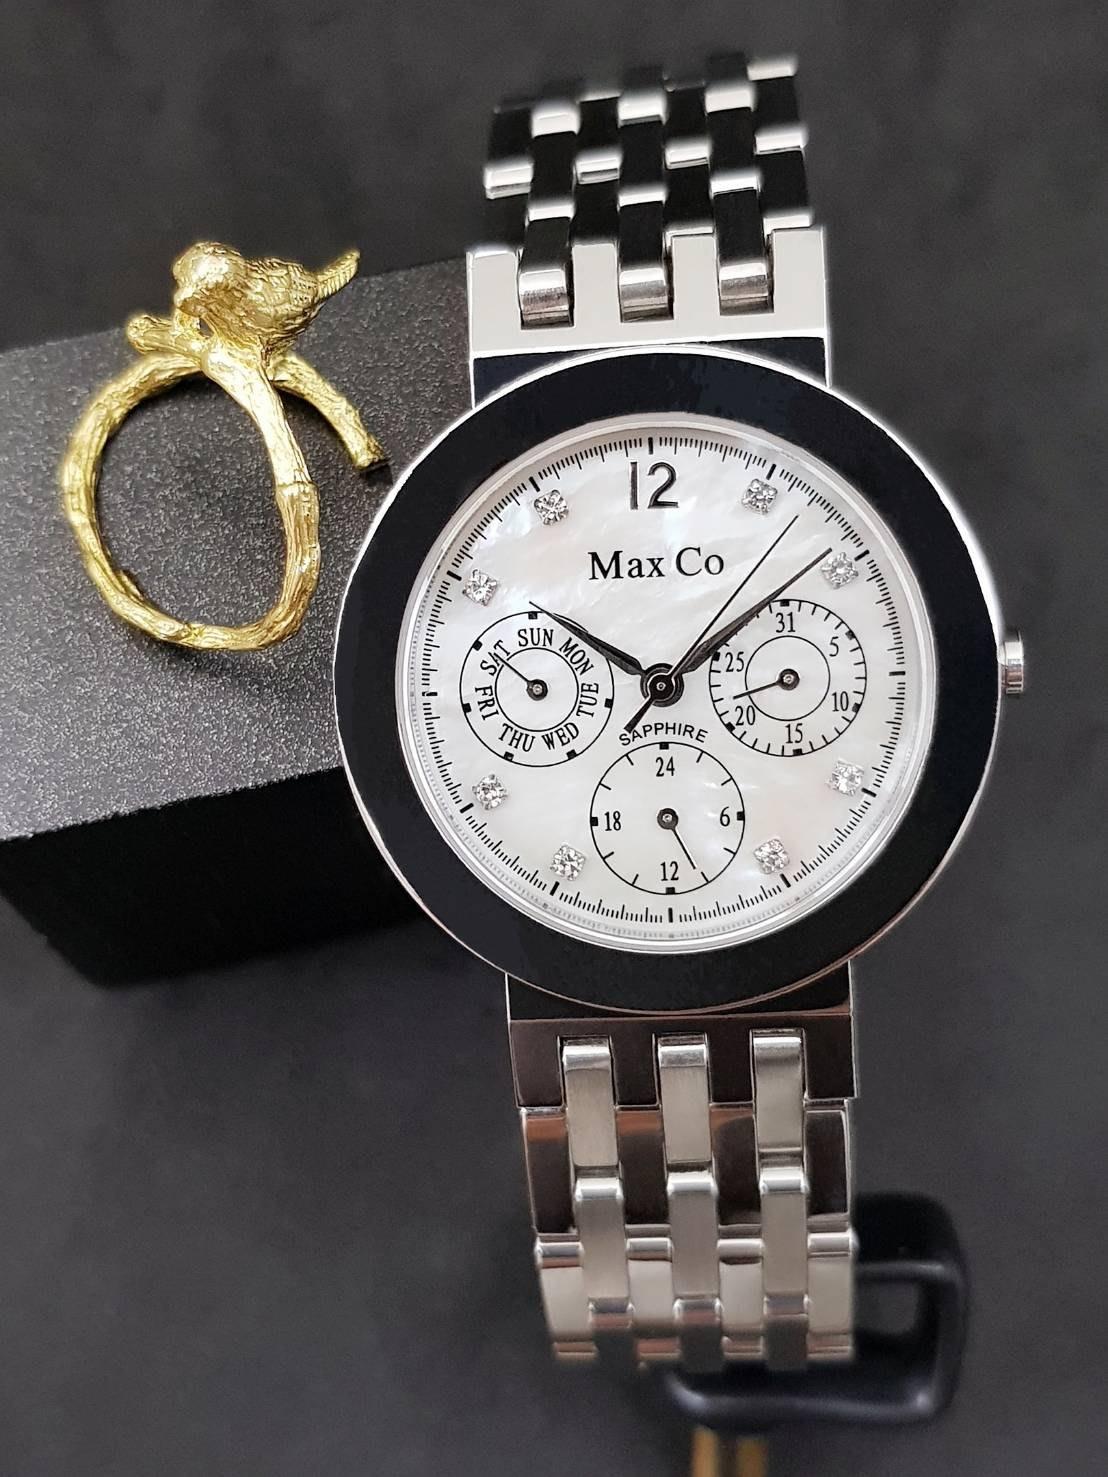 Max Co 貝殼錶面 三眼功能 不鏽鋼材質 質感腕錶【國王時計全年折扣店】MAS274-2